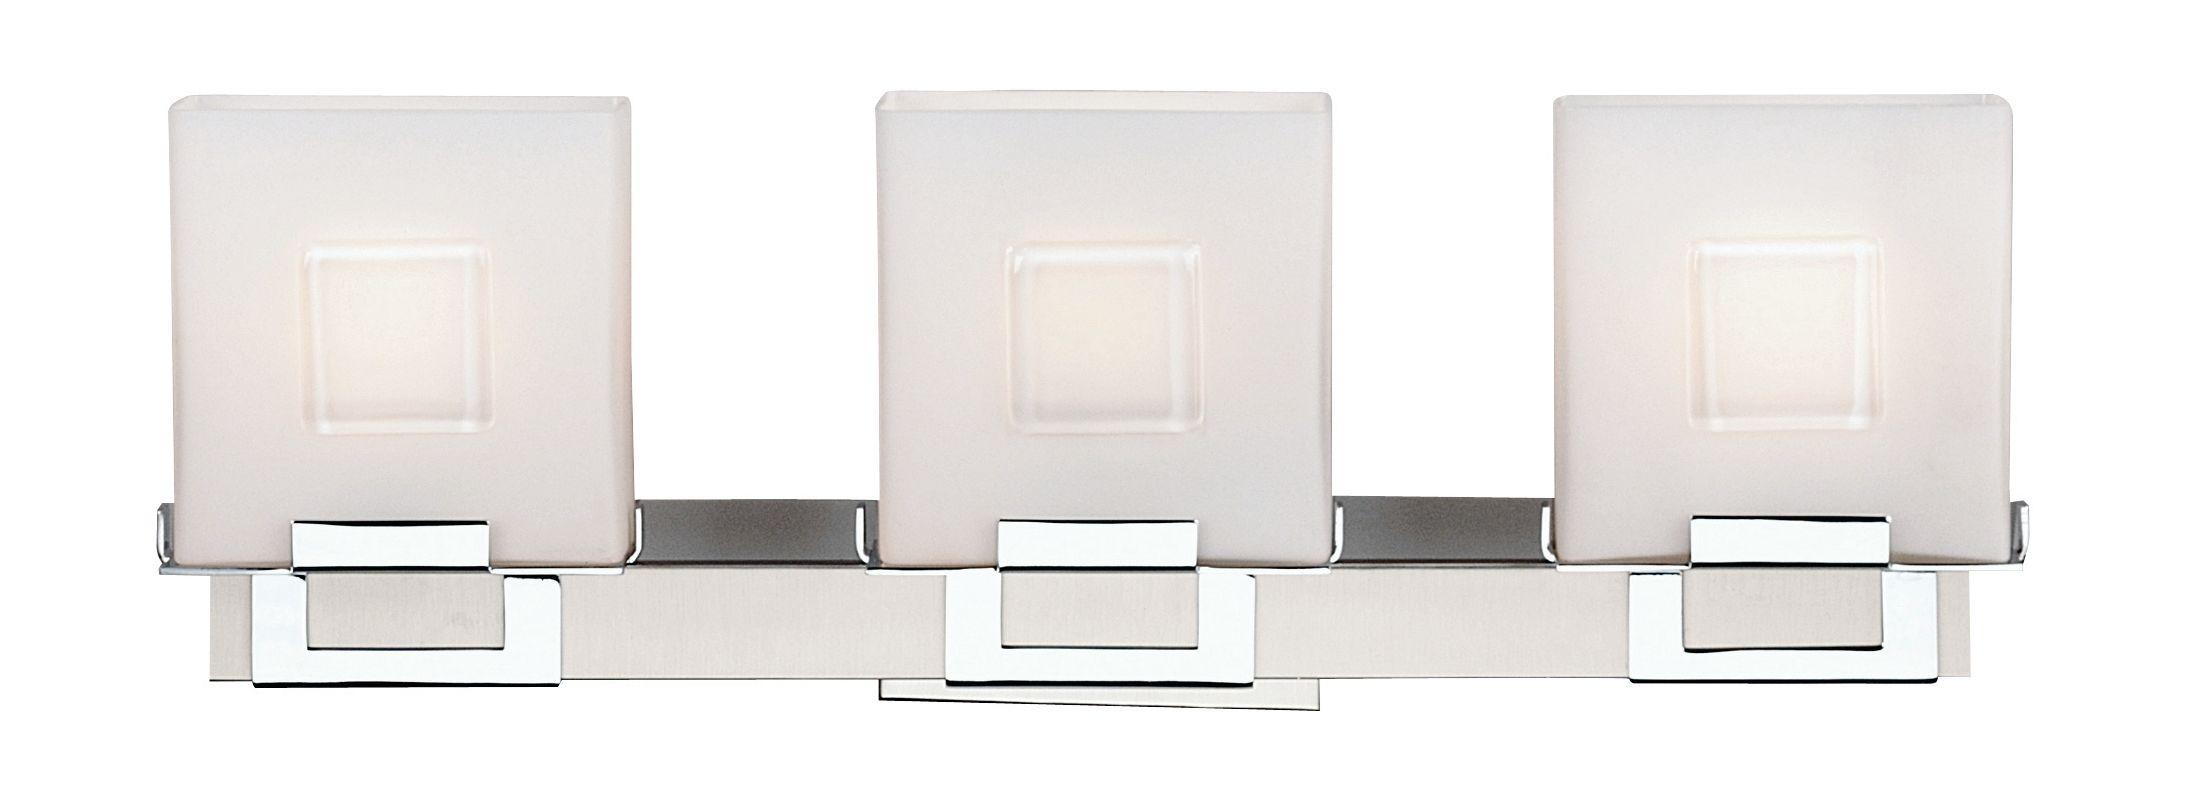 Philips F442136NV Square 3 Light Bathroom Vanity Light Satin Nickel